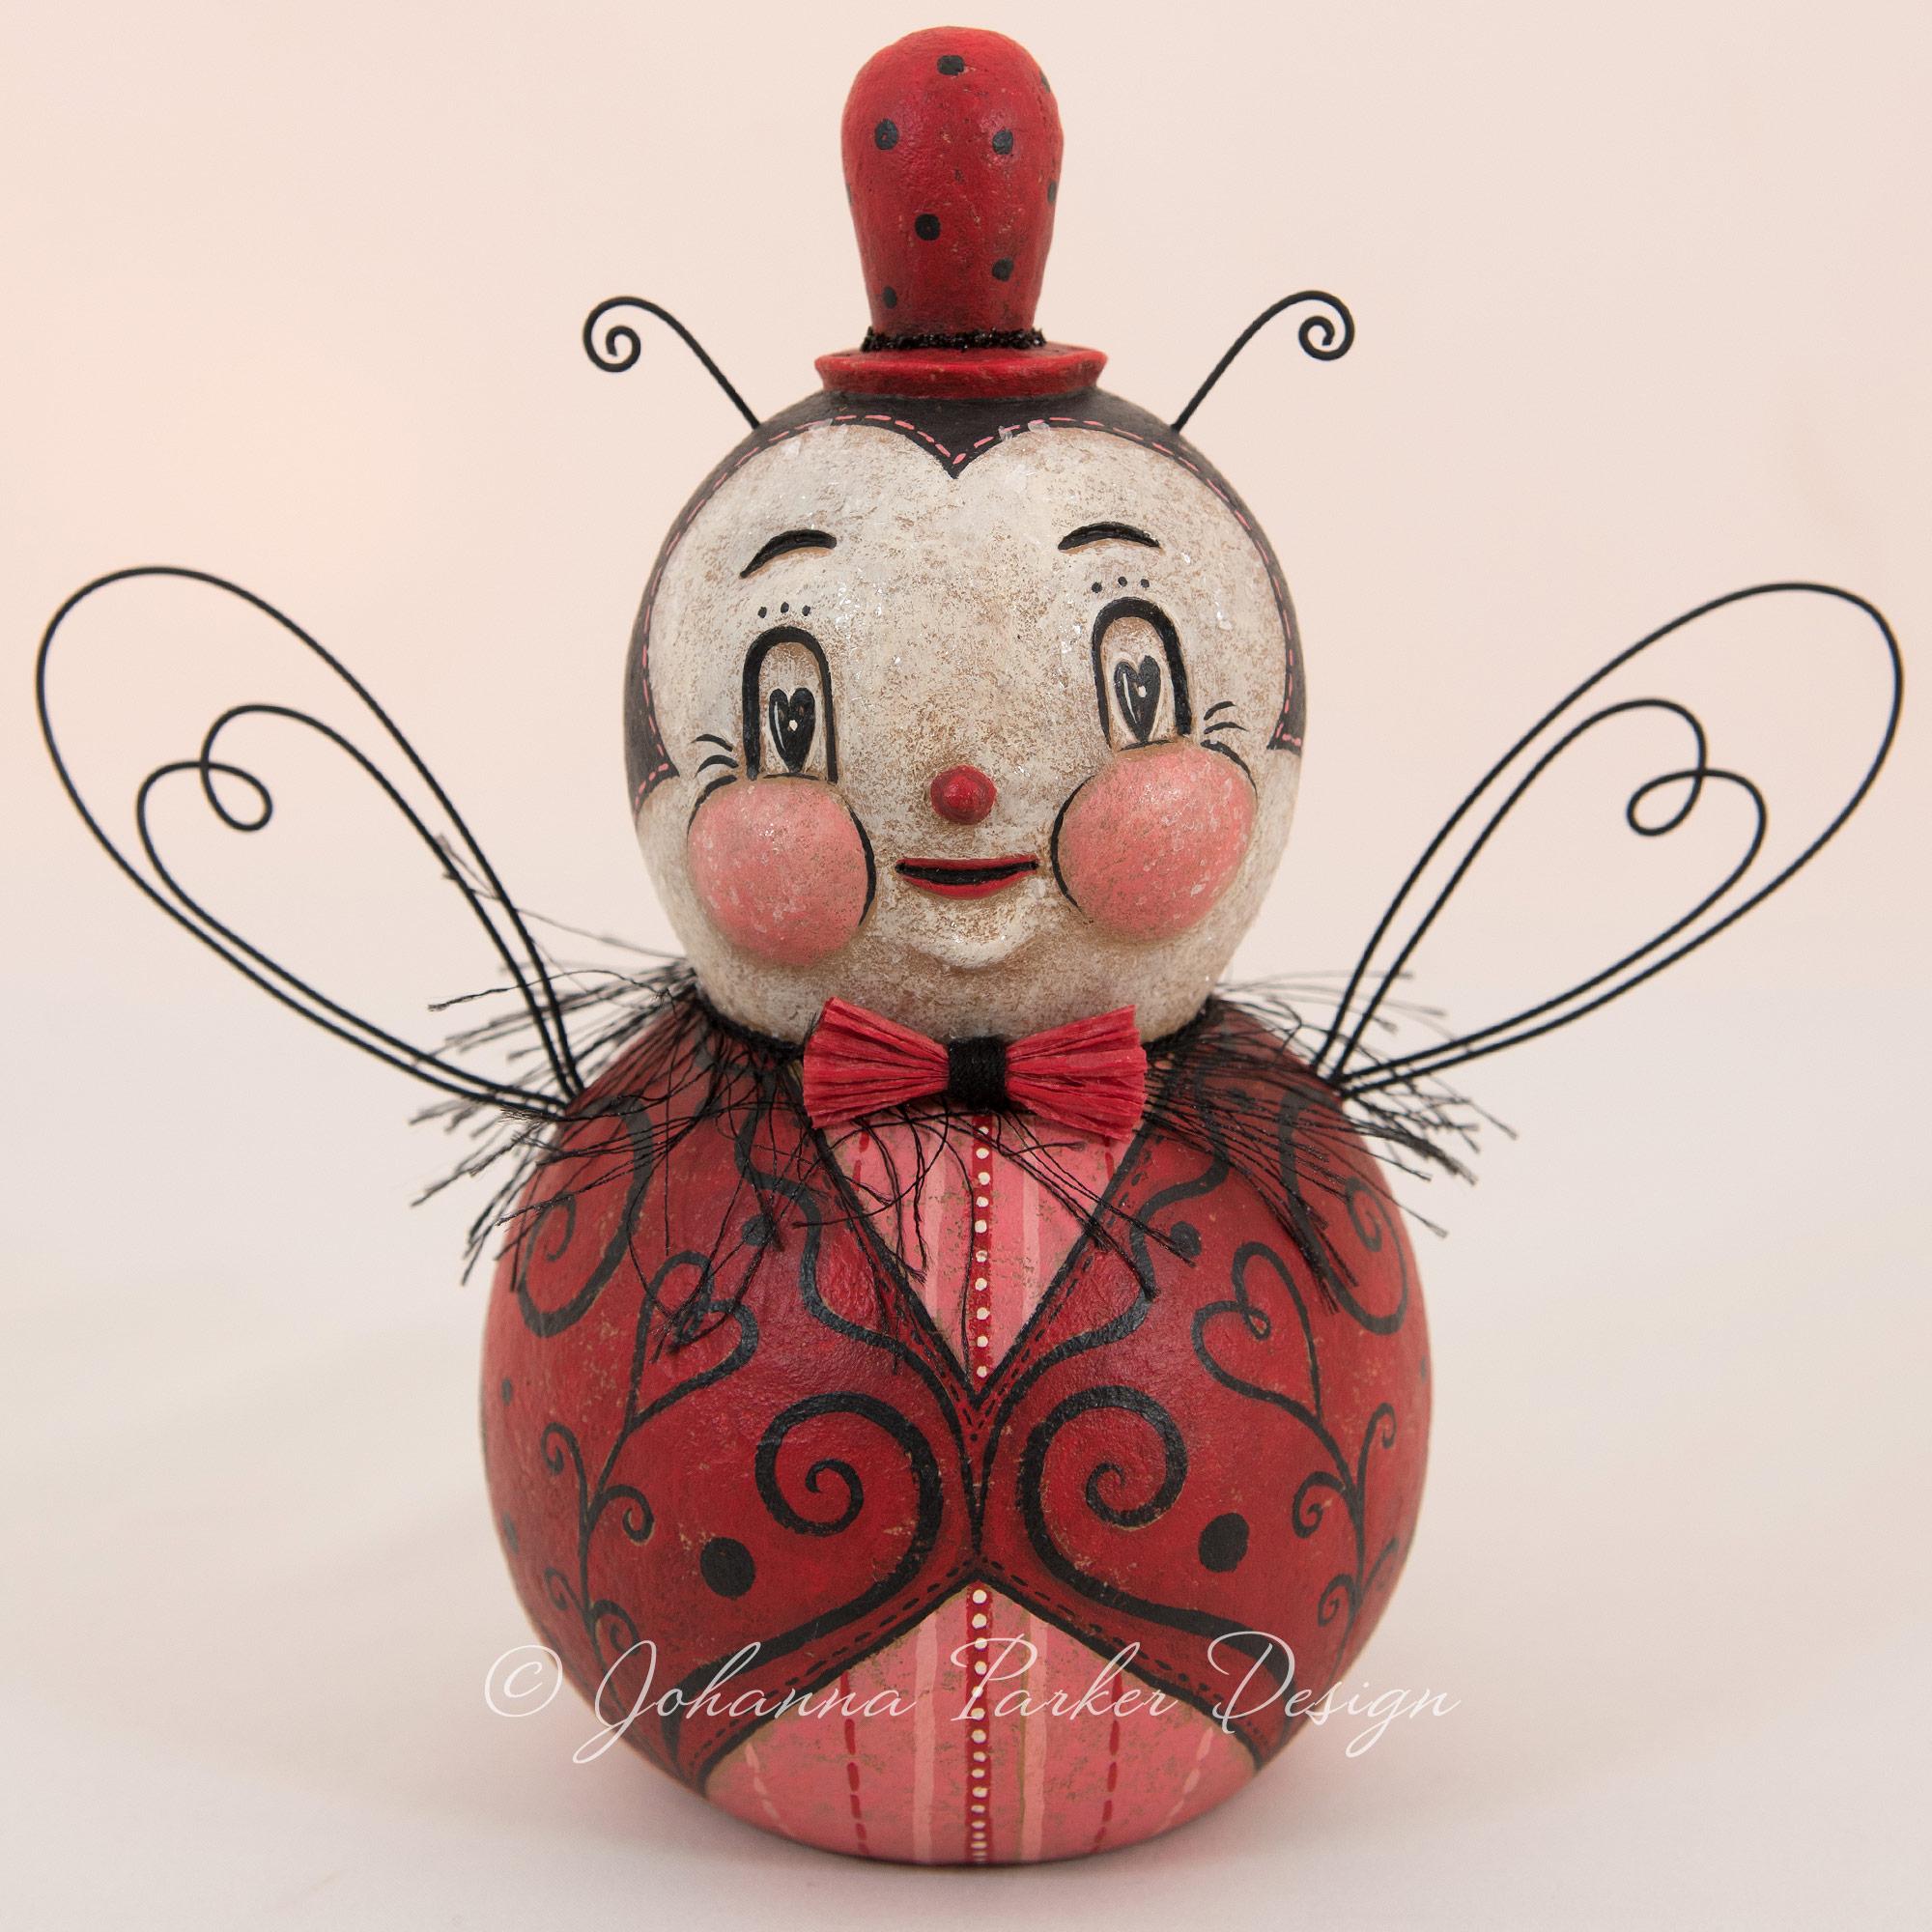 Marty-Heart-Valentine-Love-Bug-A.jpg